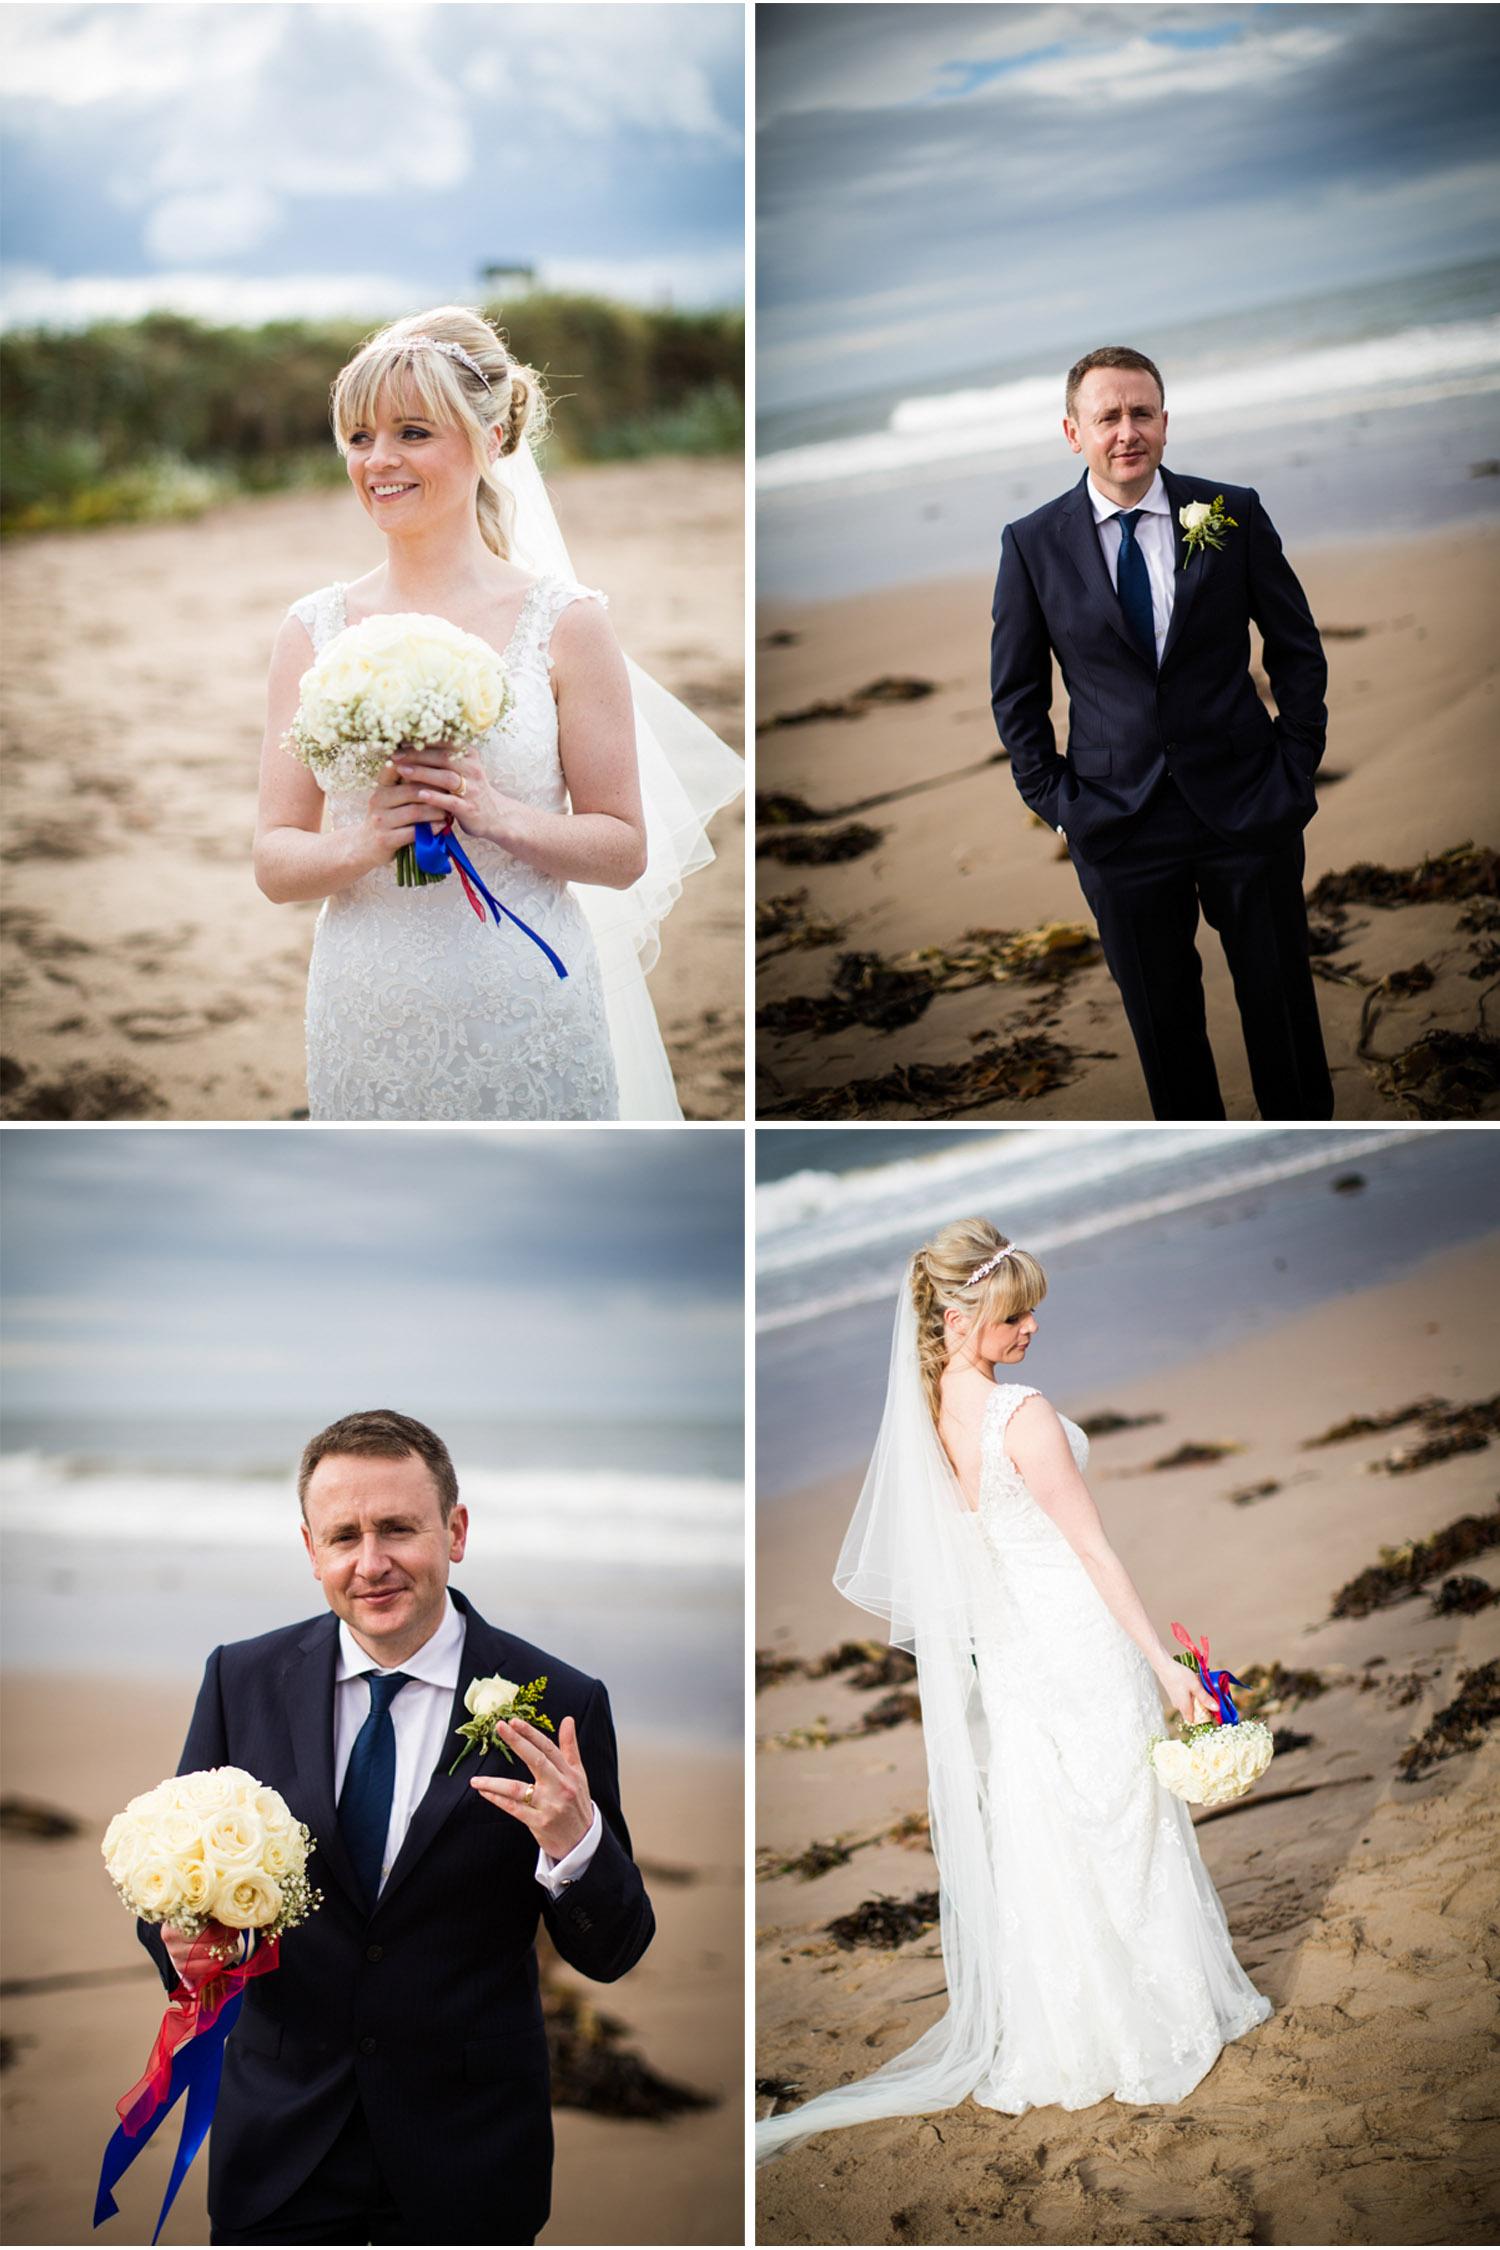 Abigail and Declan's wedding-56.jpg